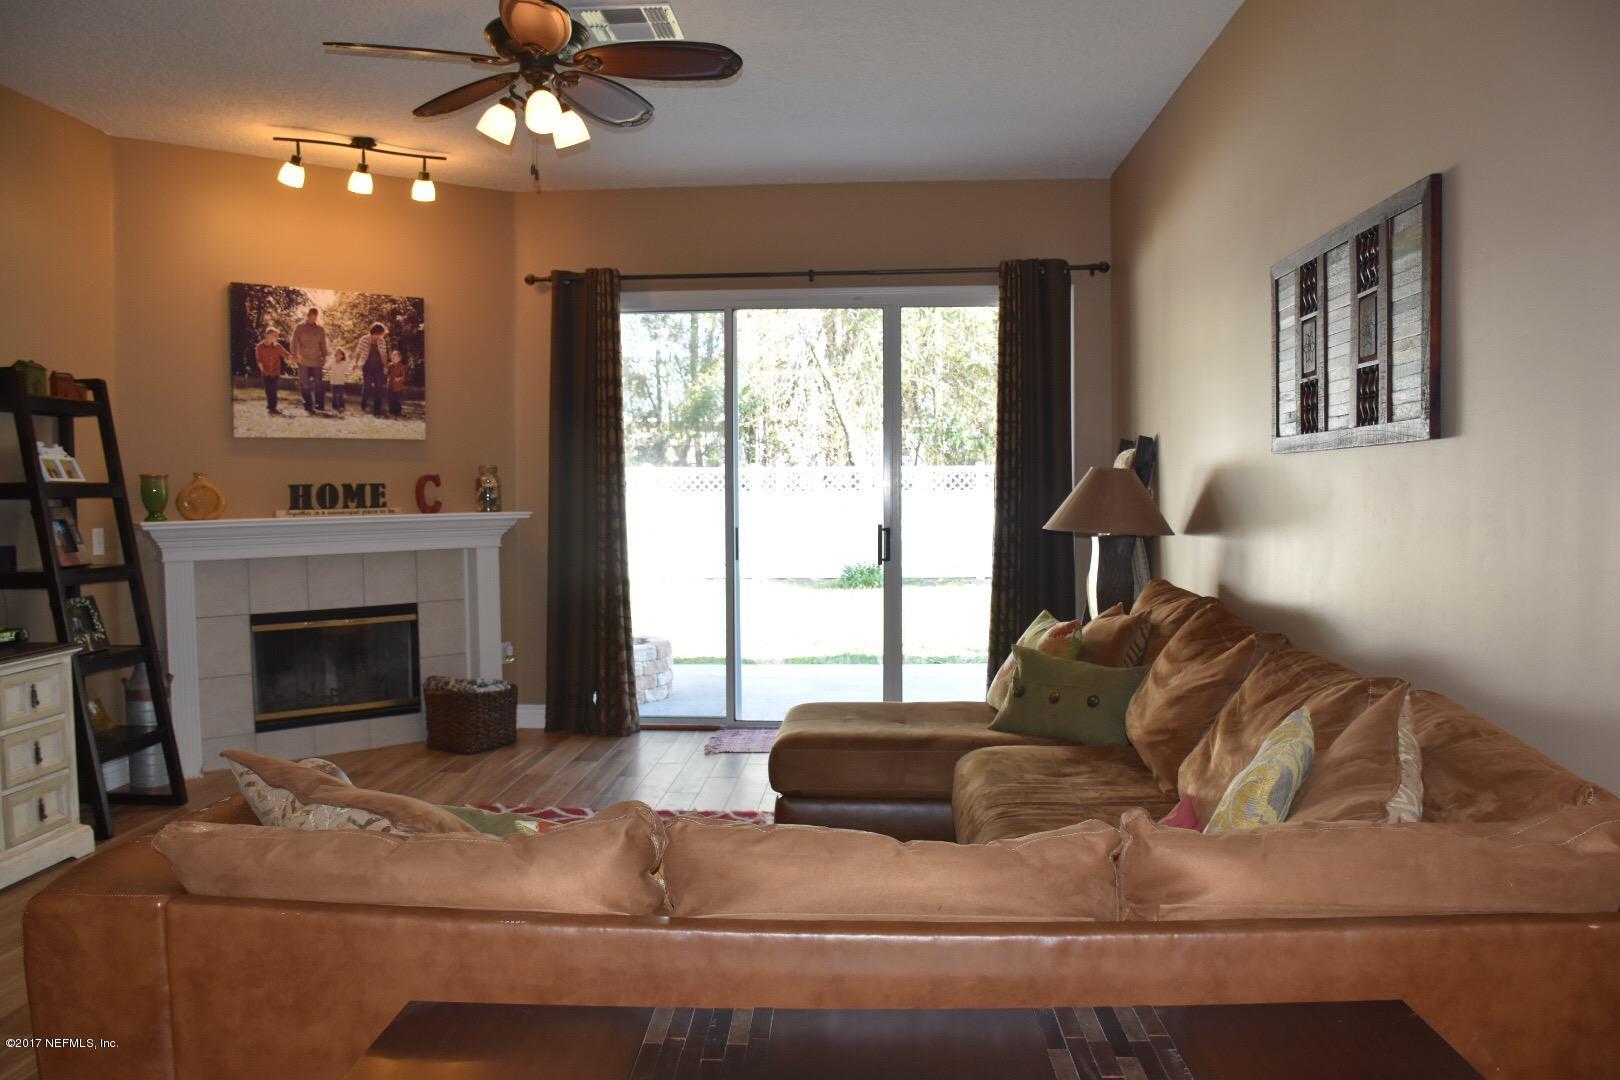 232 BETONY BRANCH,ST JOHNS,FLORIDA 32259,4 Bedrooms Bedrooms,2 BathroomsBathrooms,Residential - single family,BETONY BRANCH,866780